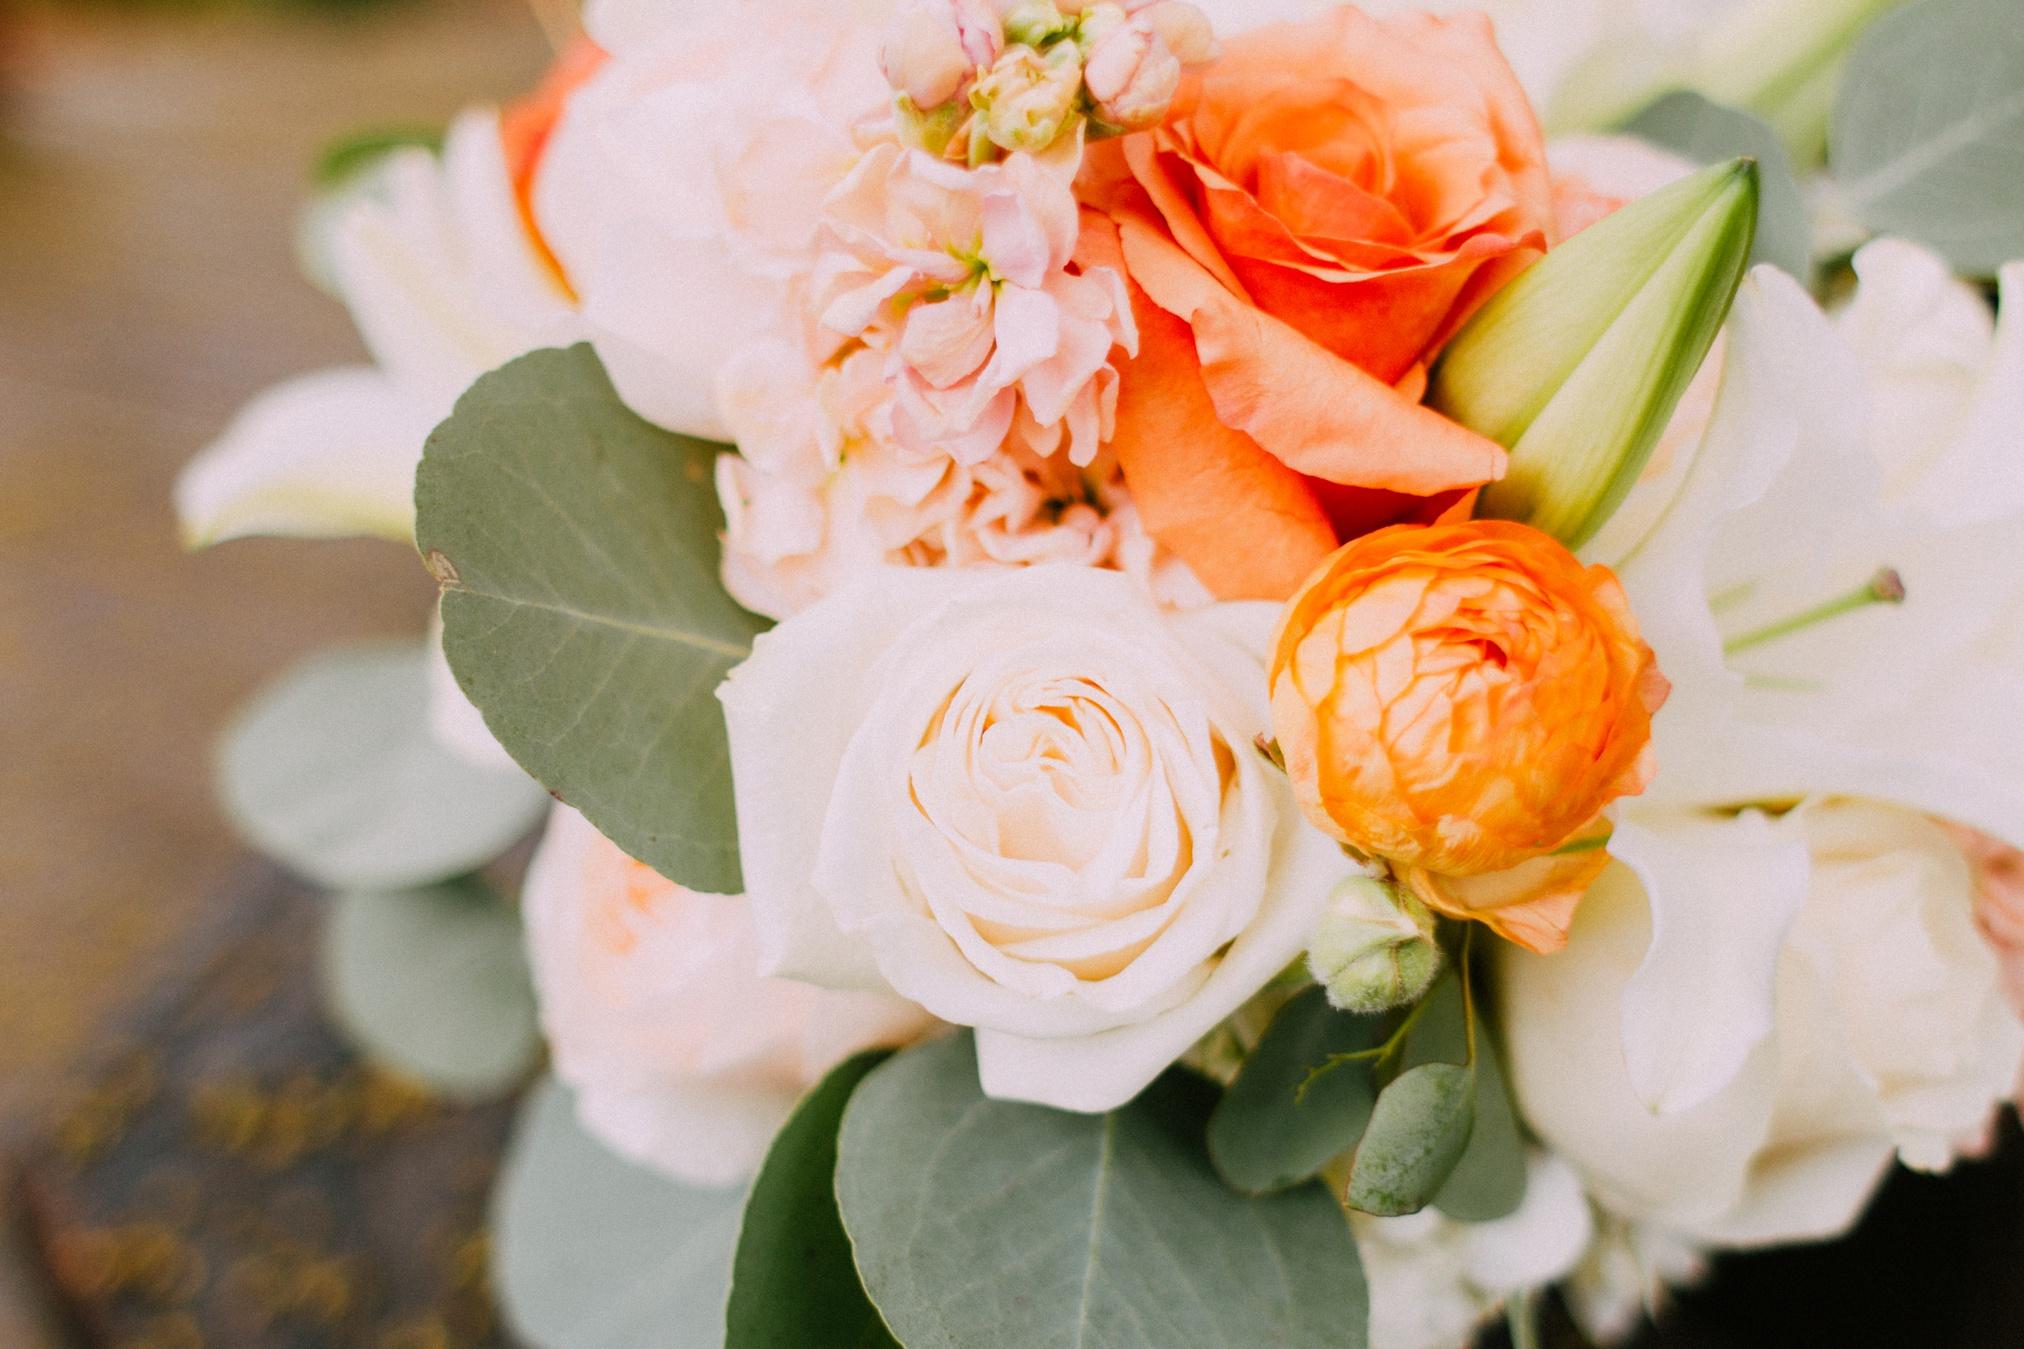 schmid_wedding-3.jpg